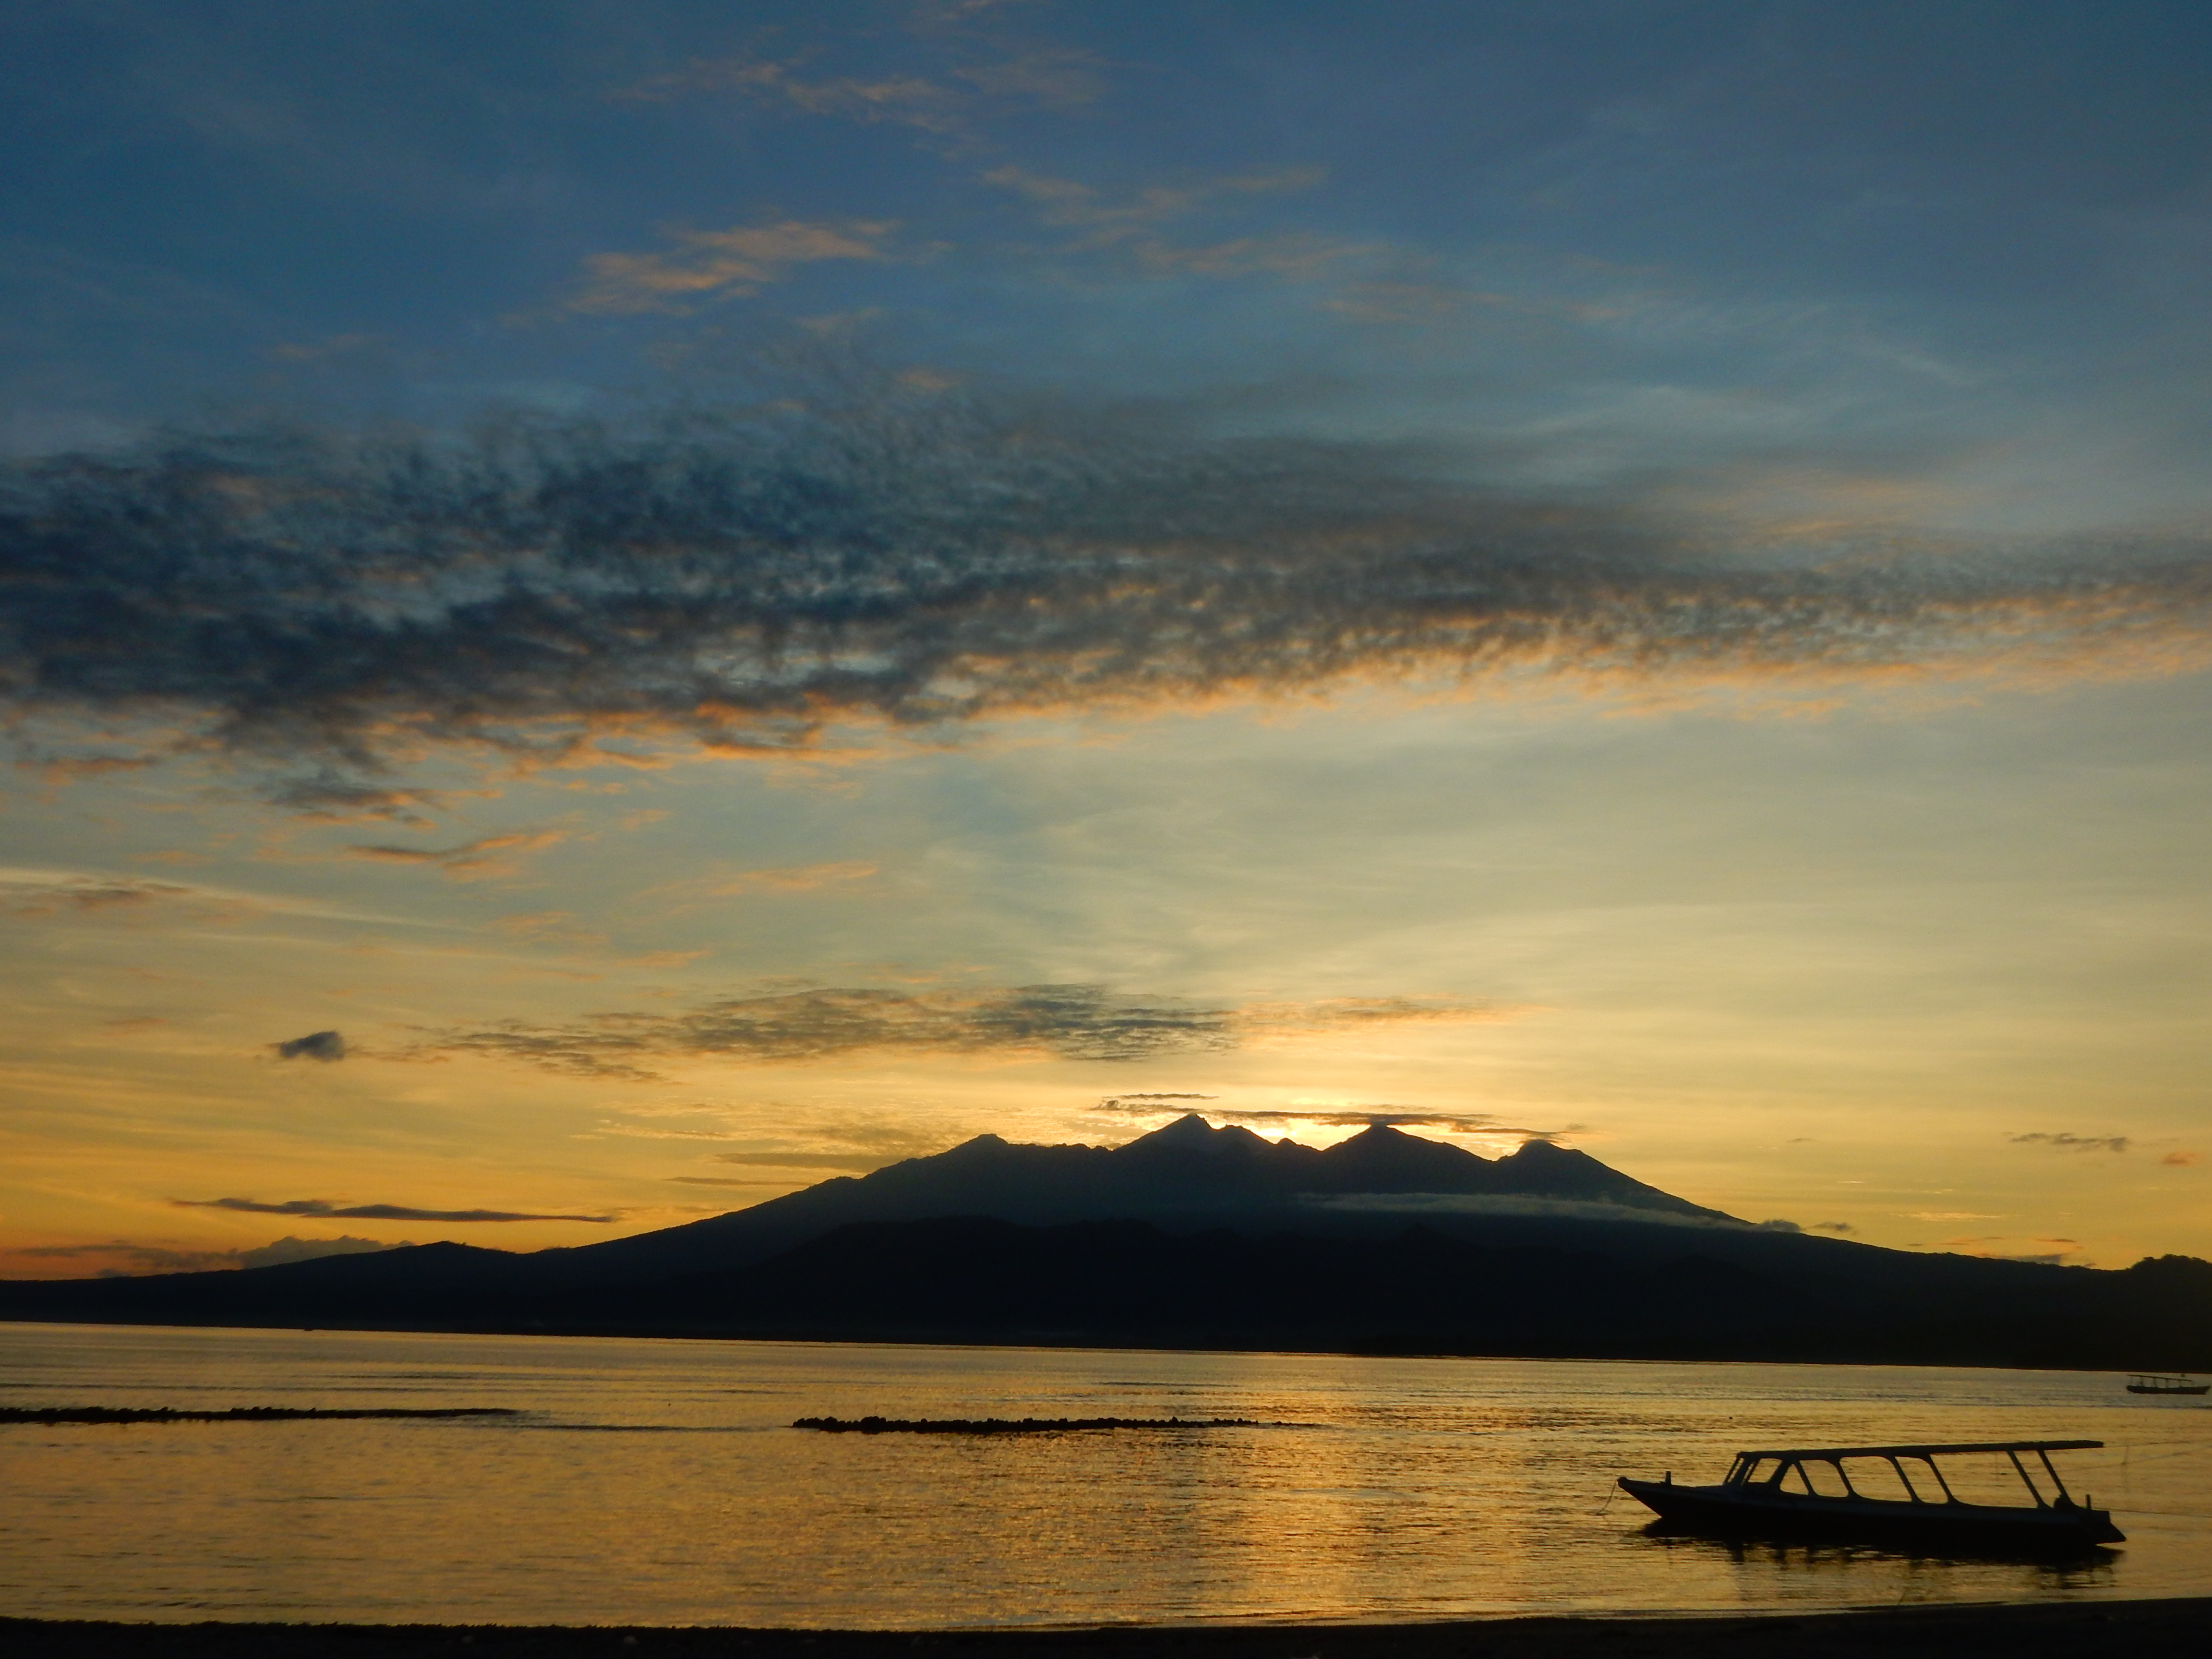 Lever de soleil, Sunrise, Gili Air, Indonésie